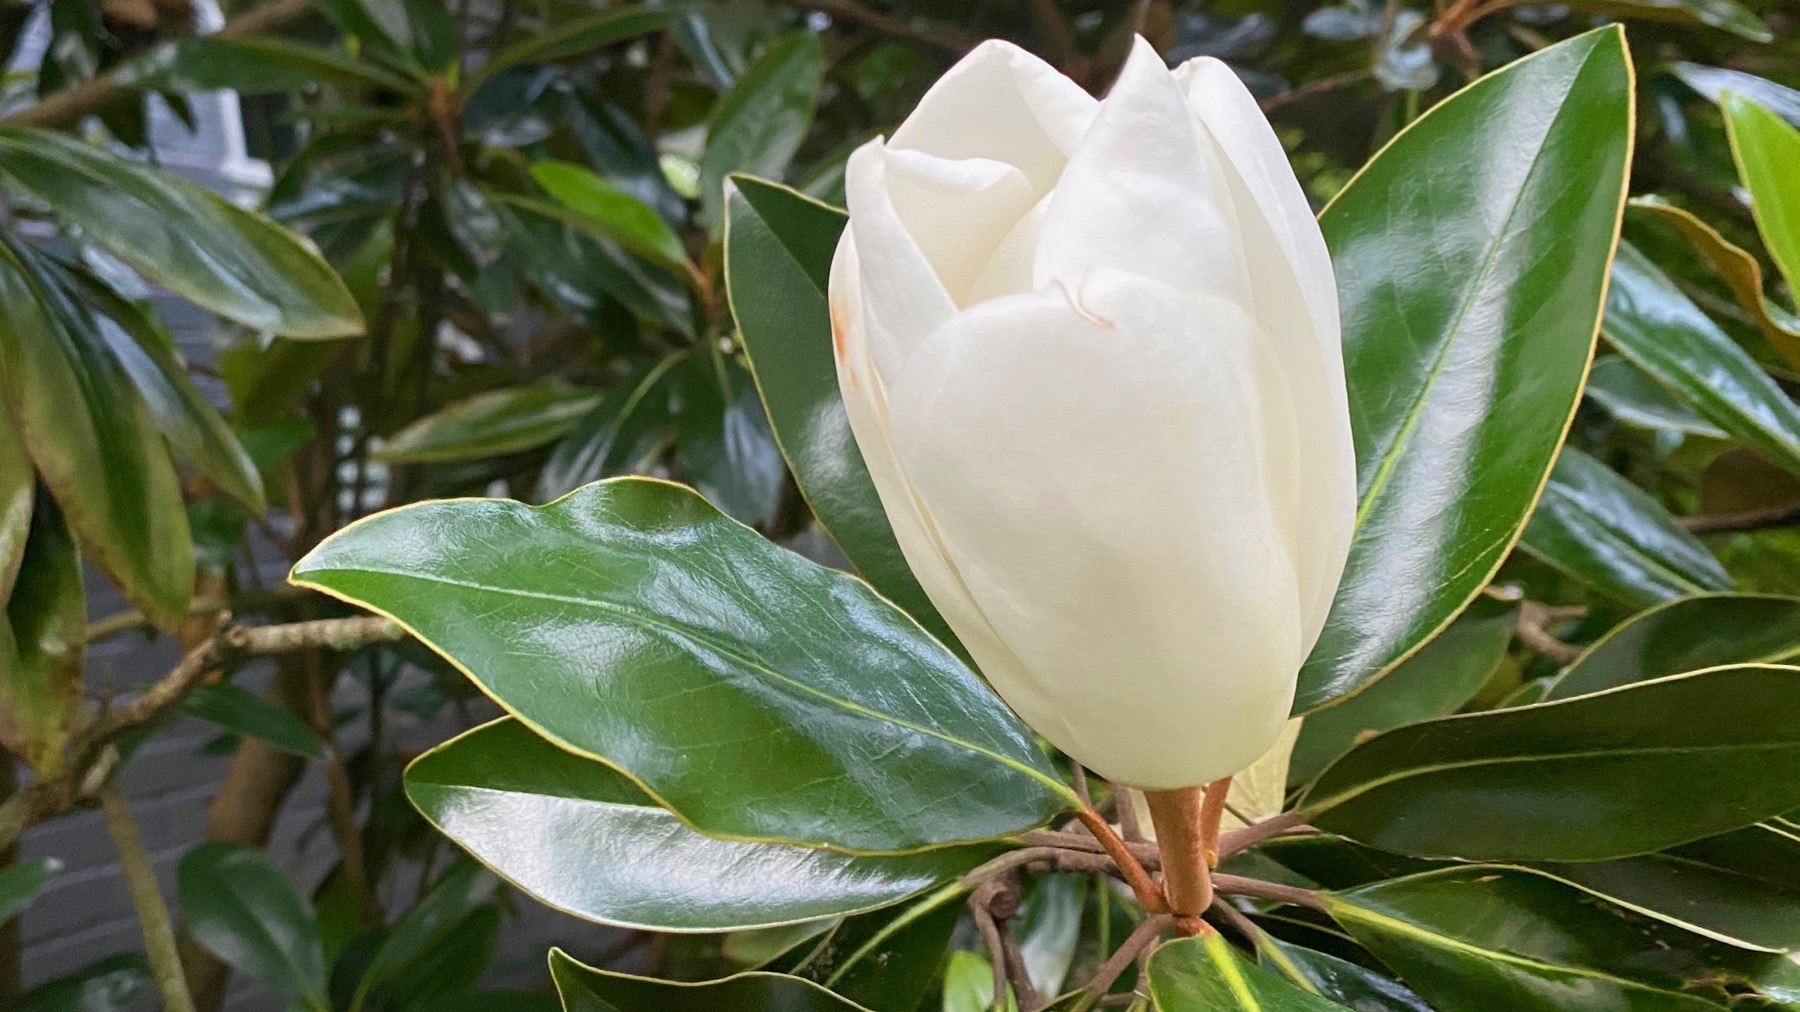 Magnolia half open